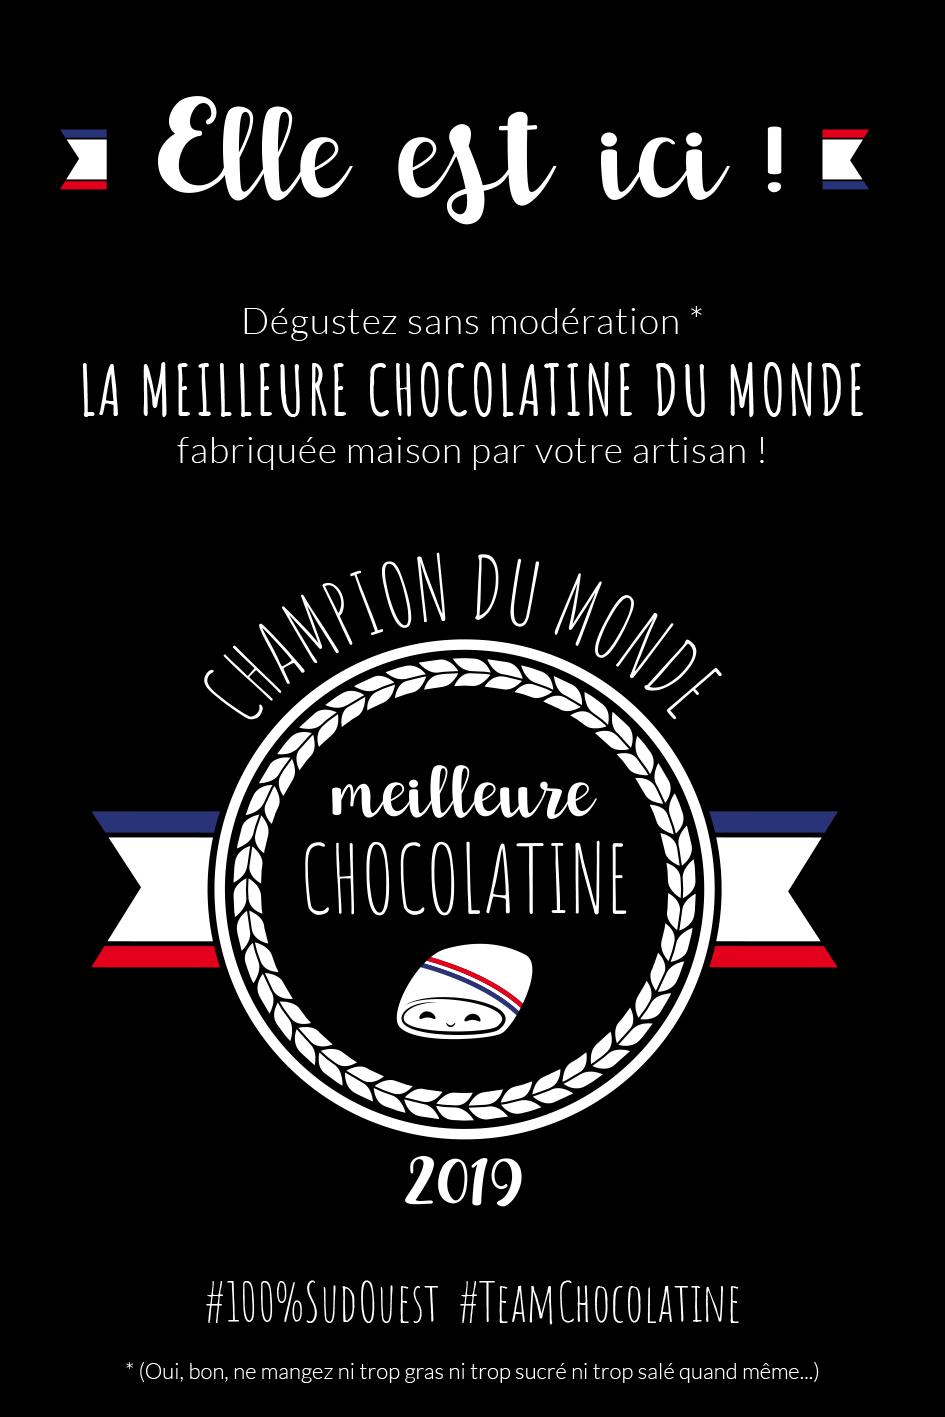 prix mondial chocolatine illustration